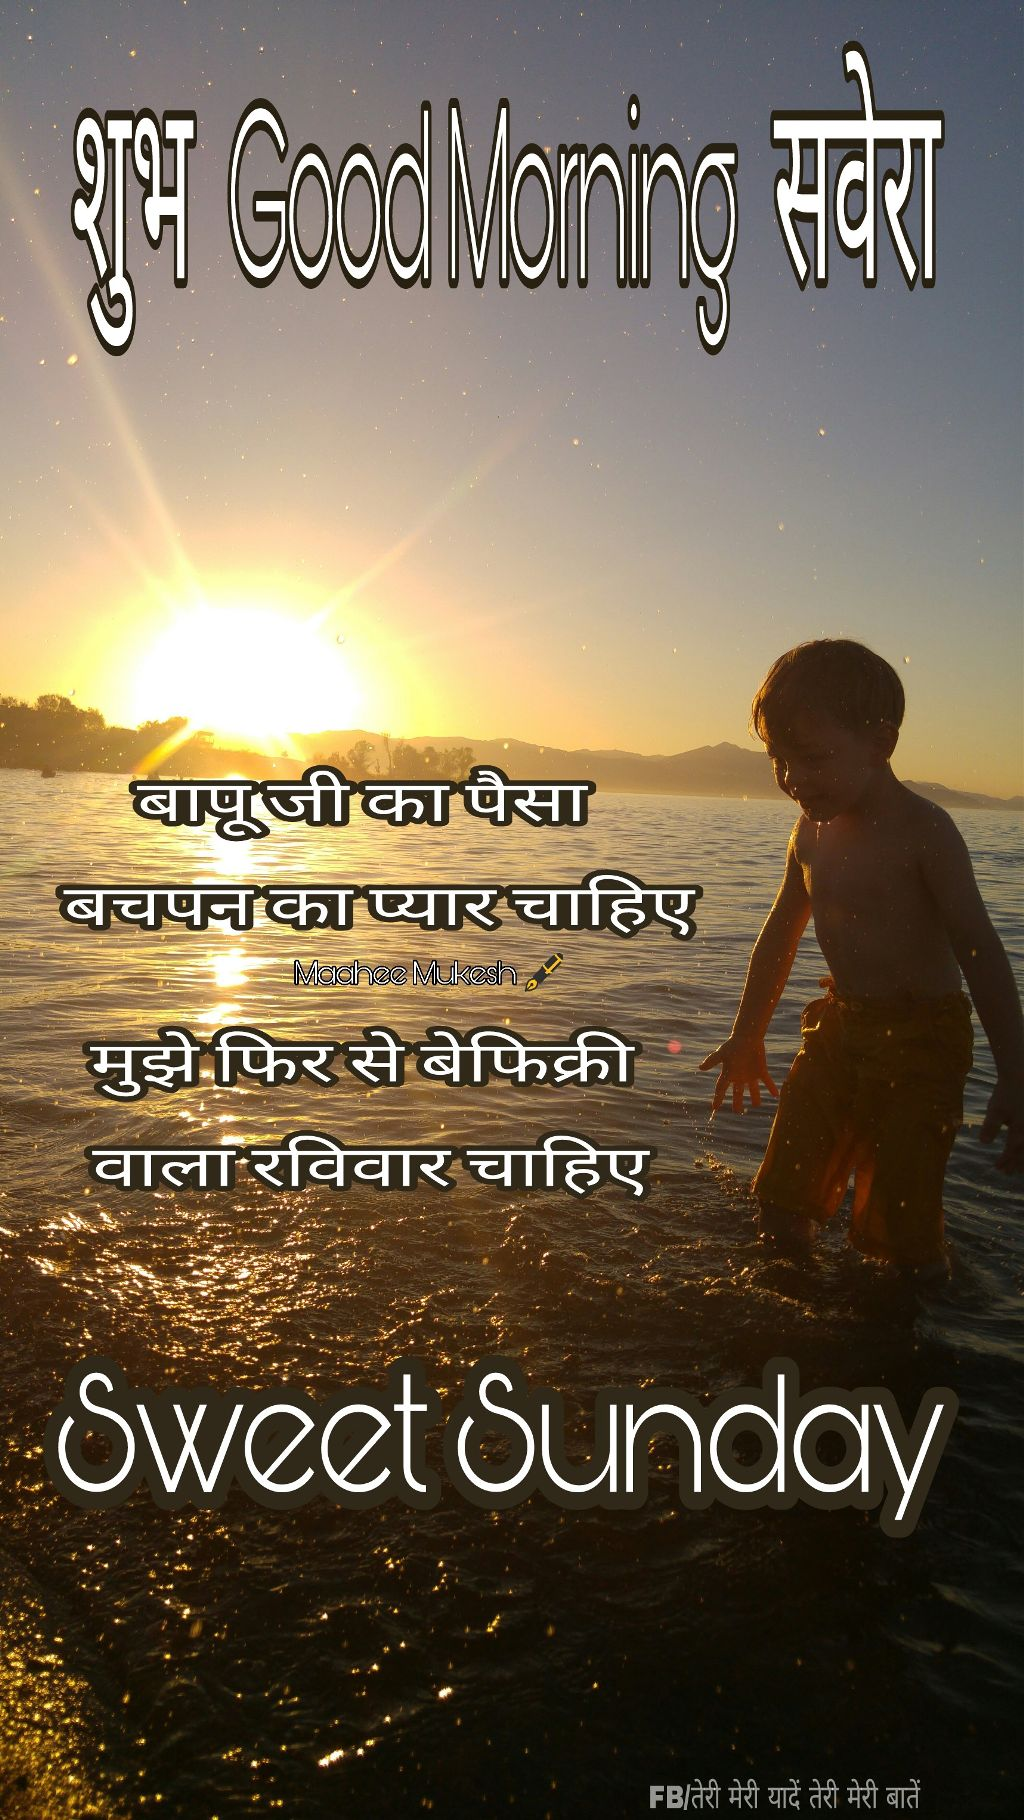 Punjabi shayari images in hindi